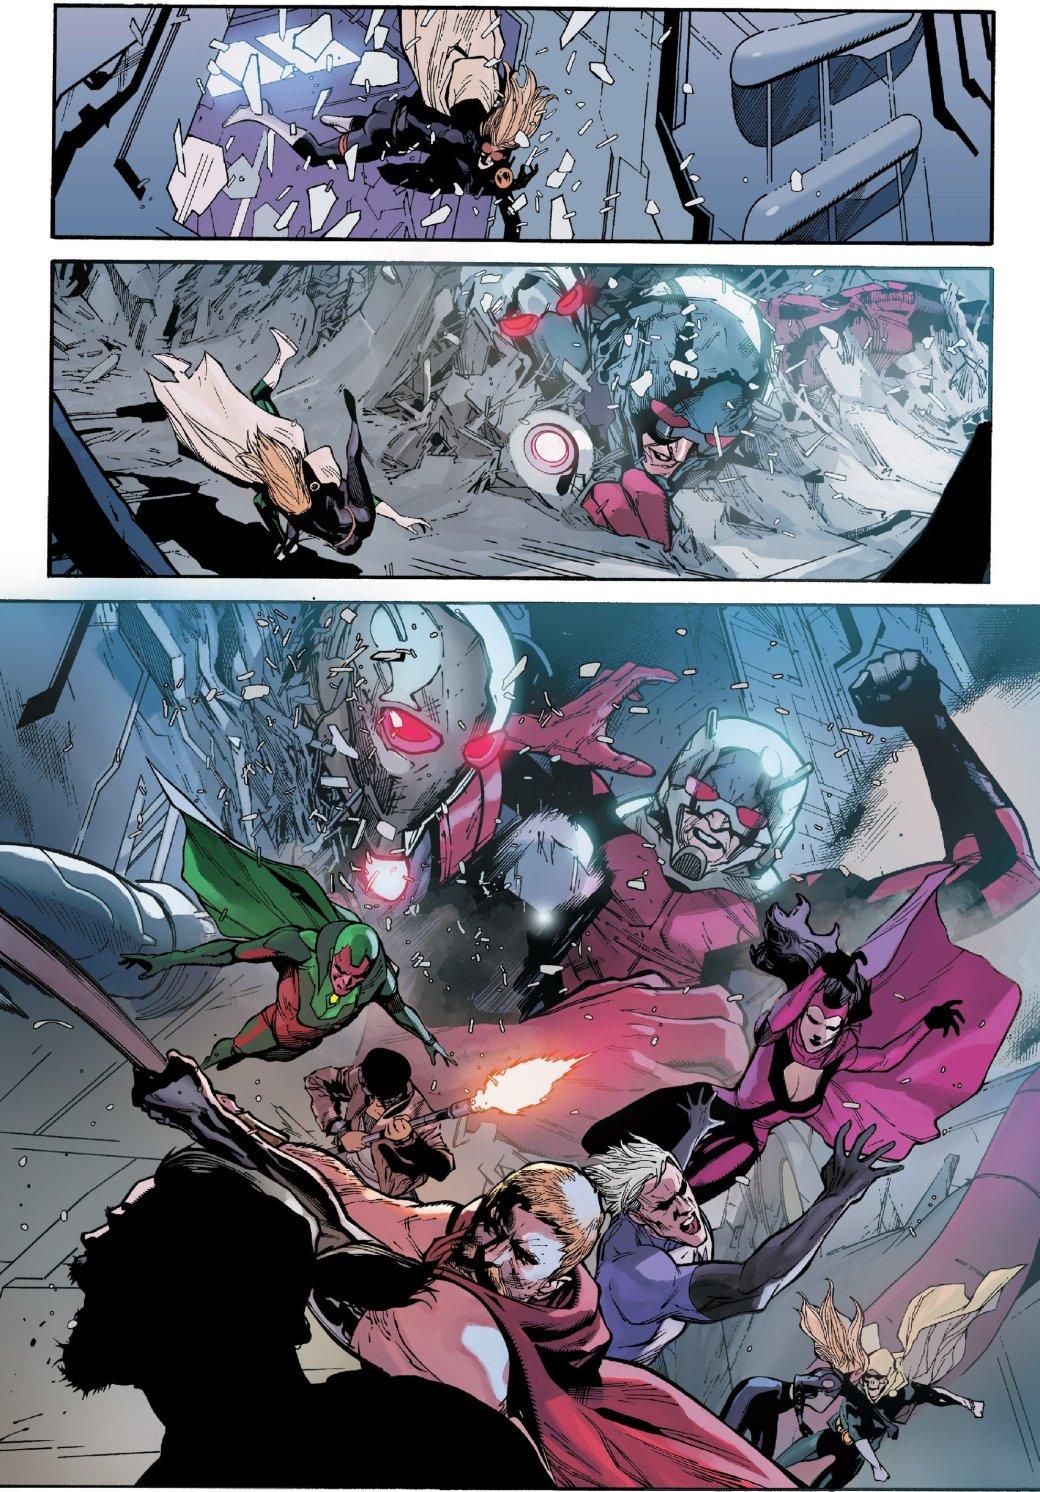 Secret Empire: противостоянию Стива Роджерса иТони Старка нет конца - Изображение 17